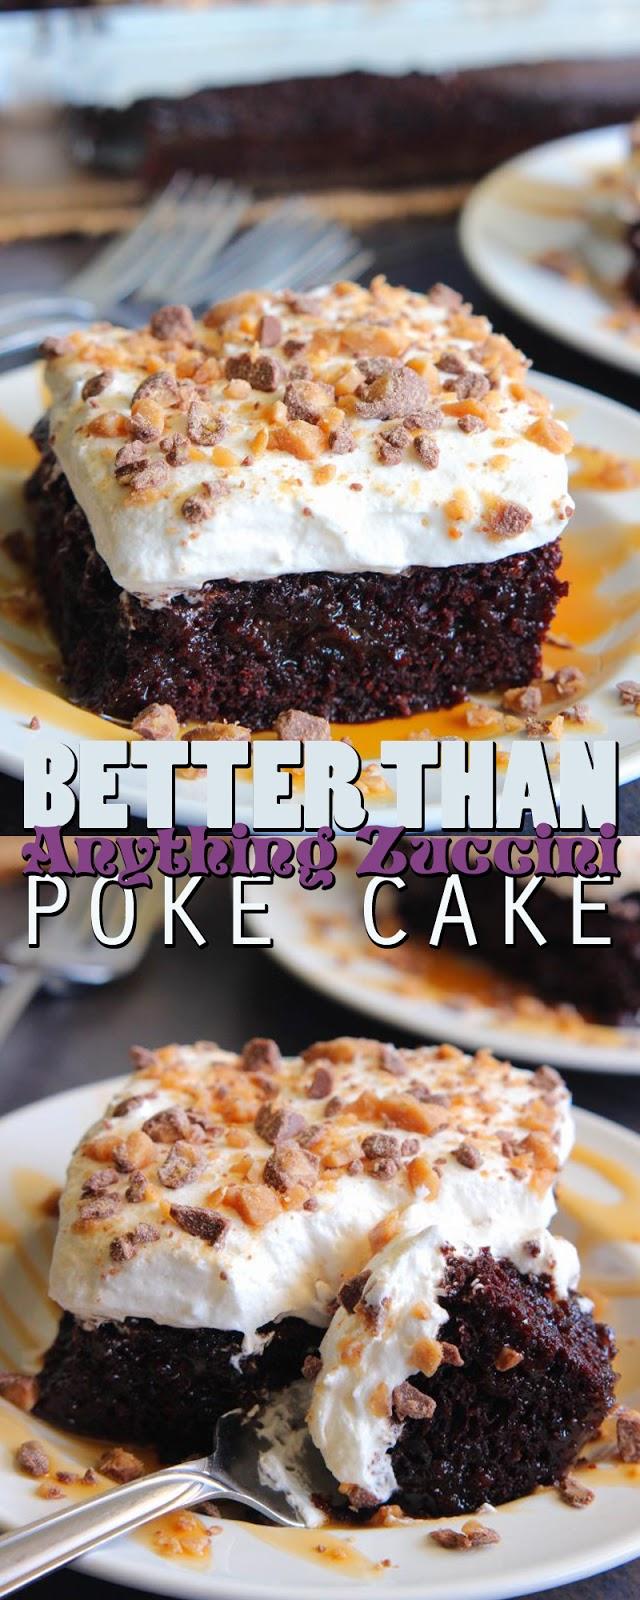 BETTER THAN ANYTHING ZUCCHINI POKE CAKE